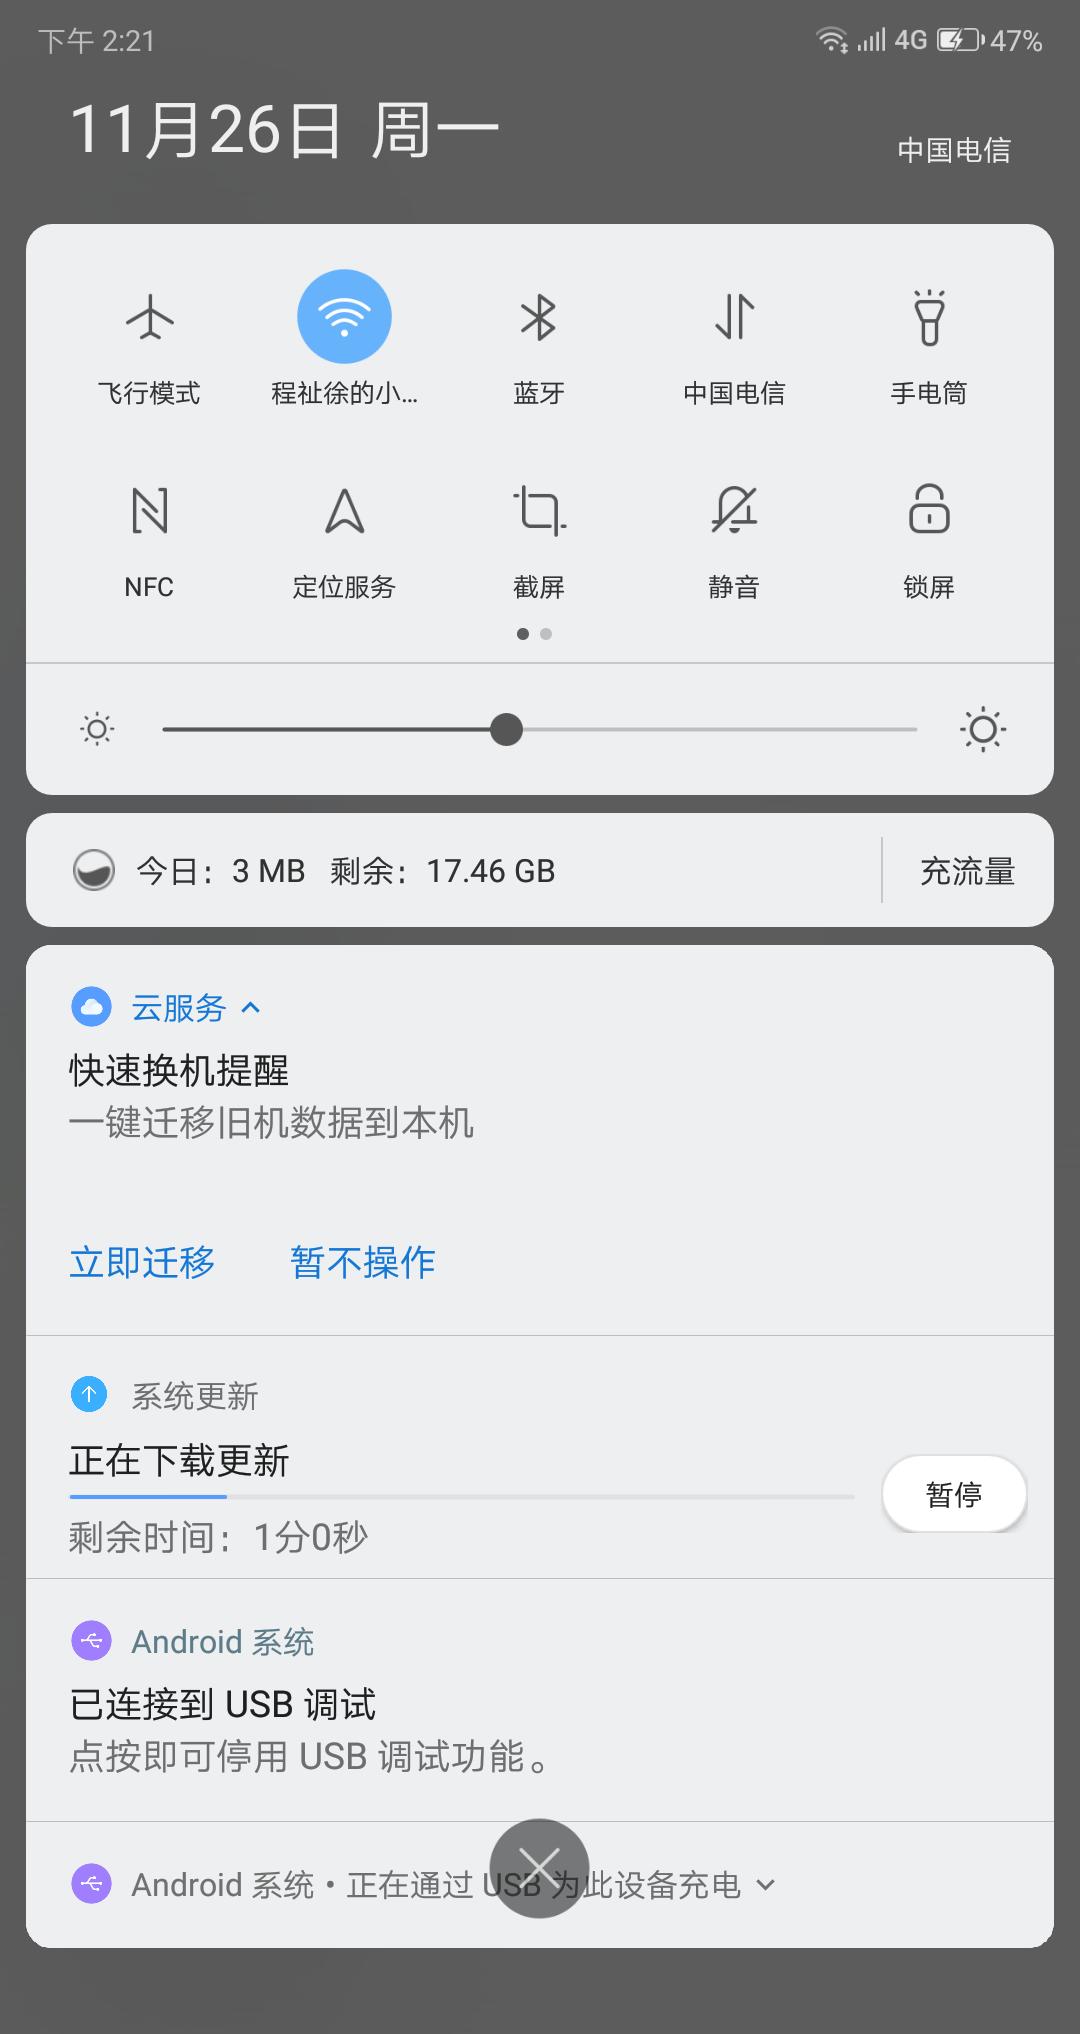 Screenshot_2018-11-26-14-21-23-0718671232.png